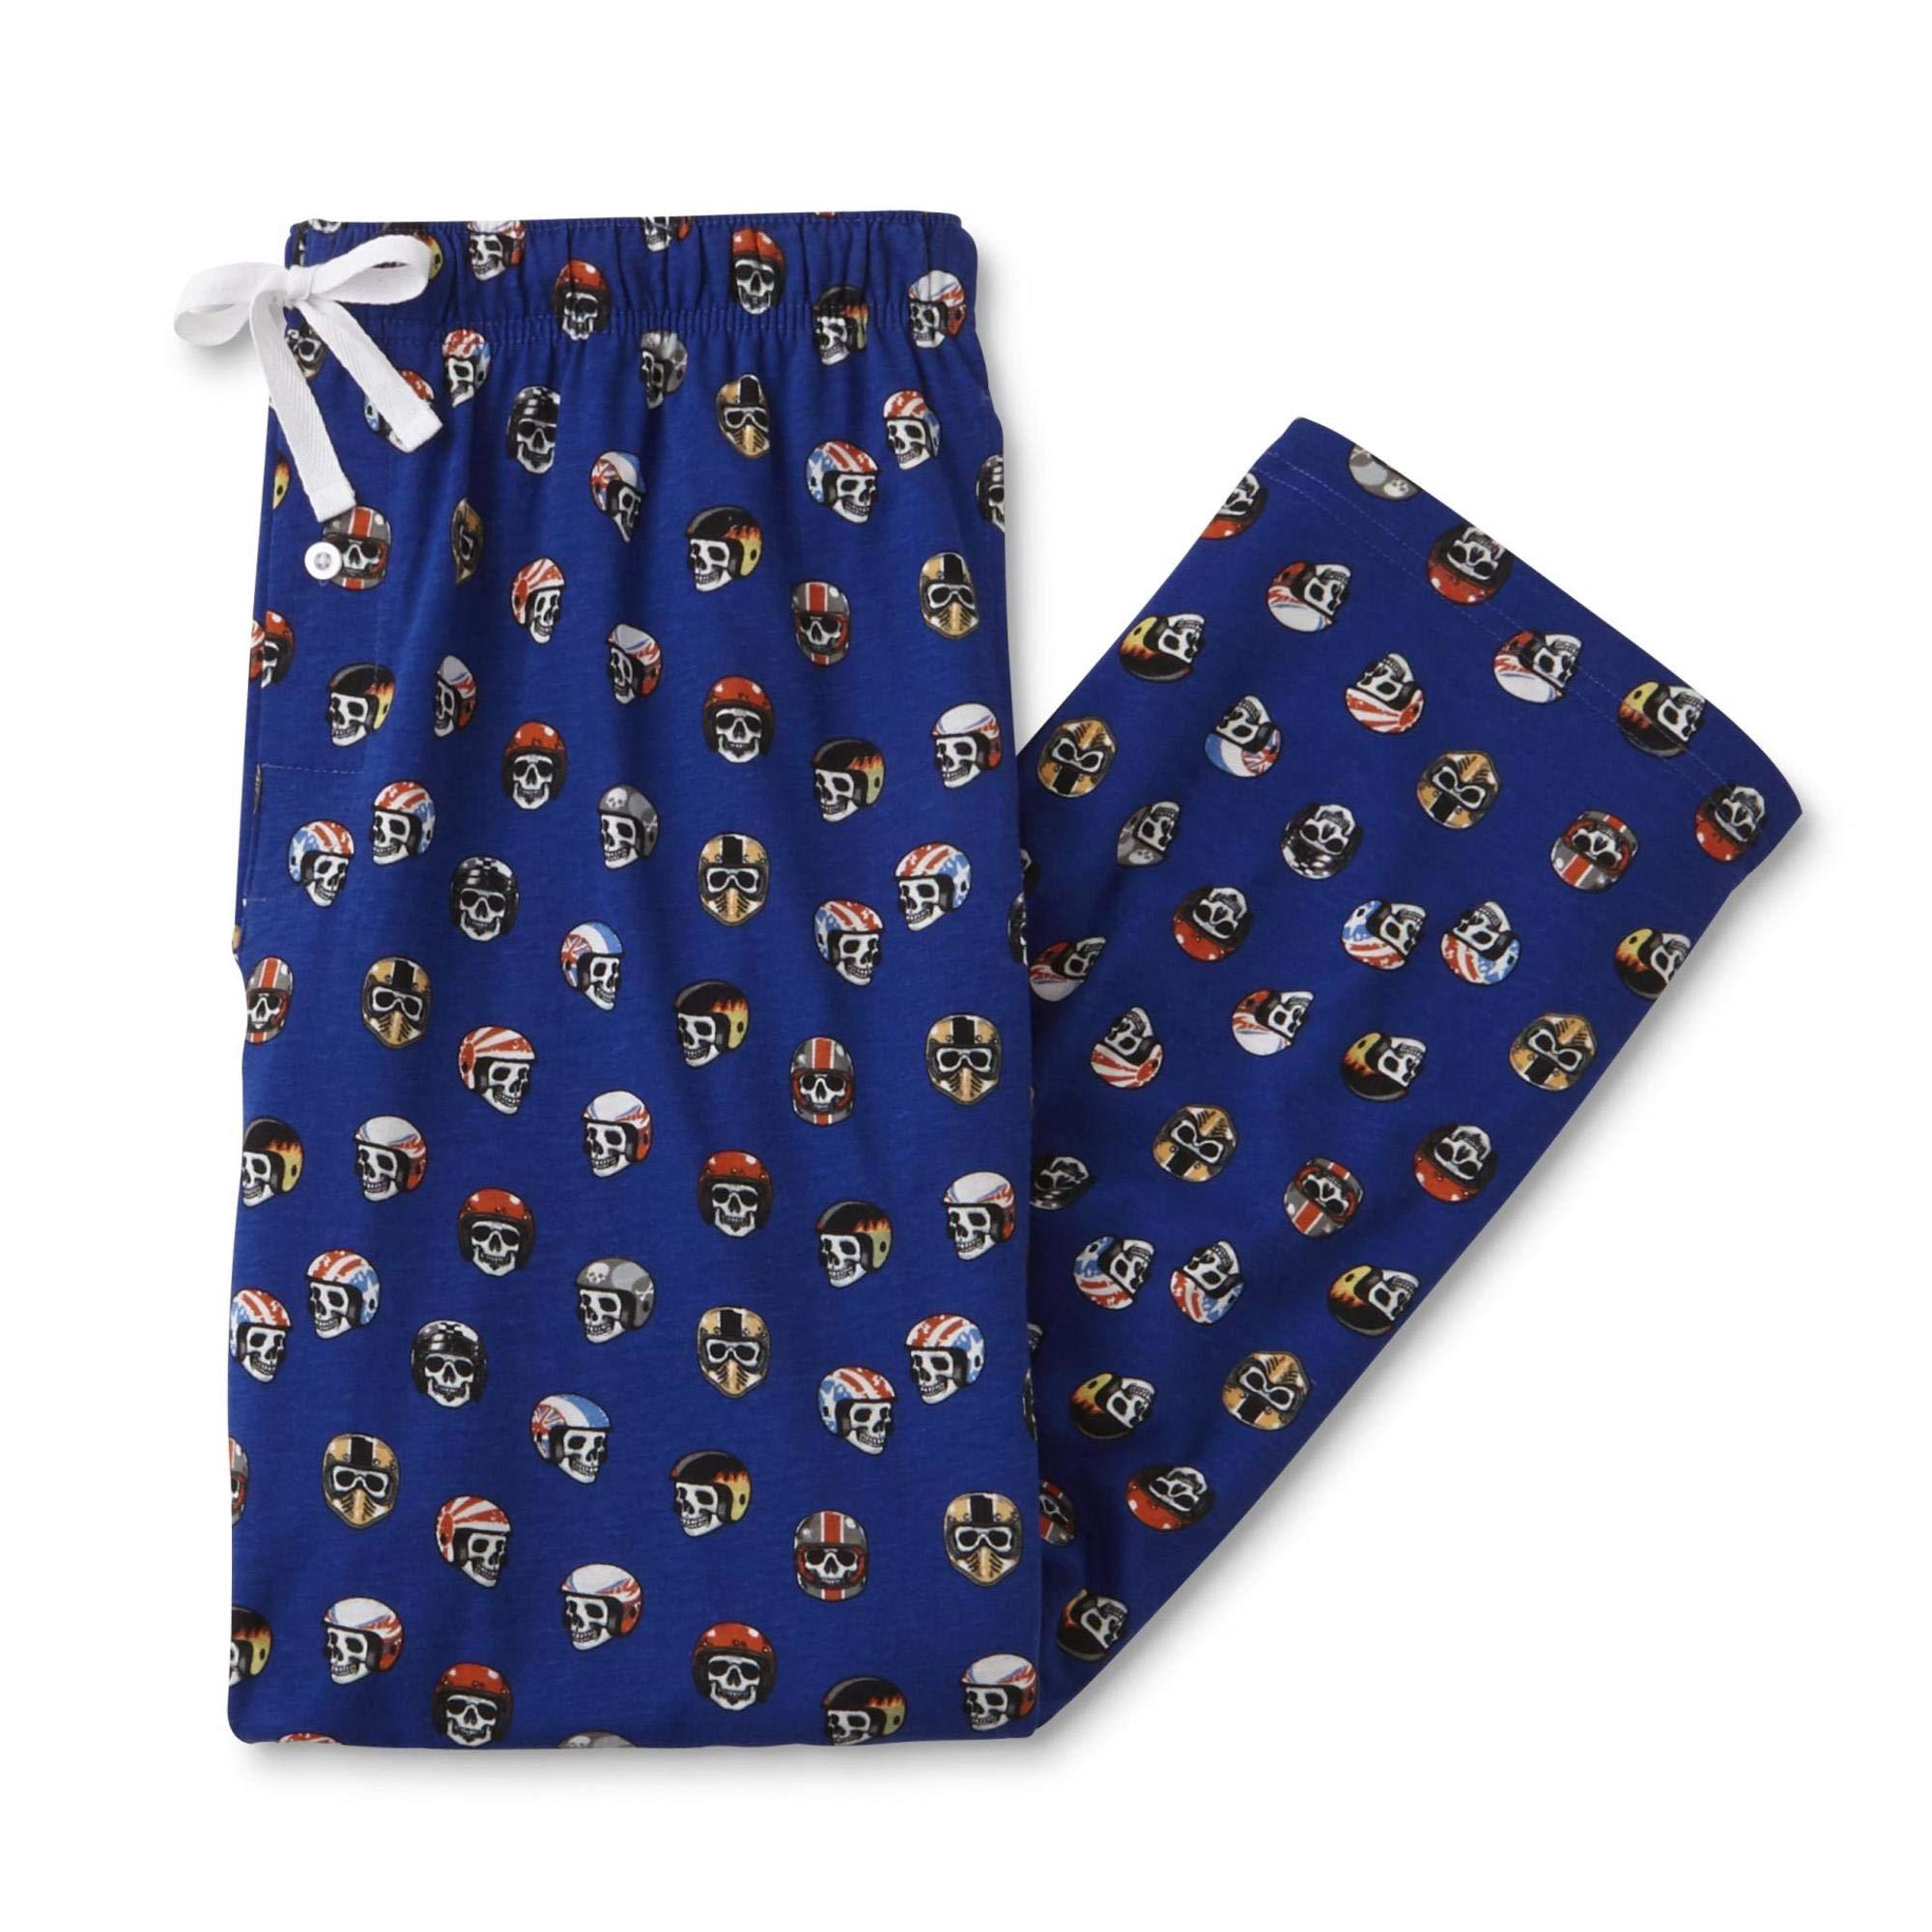 KingSize Mens Big /& Tall Licensed Novelty Pajama Pants